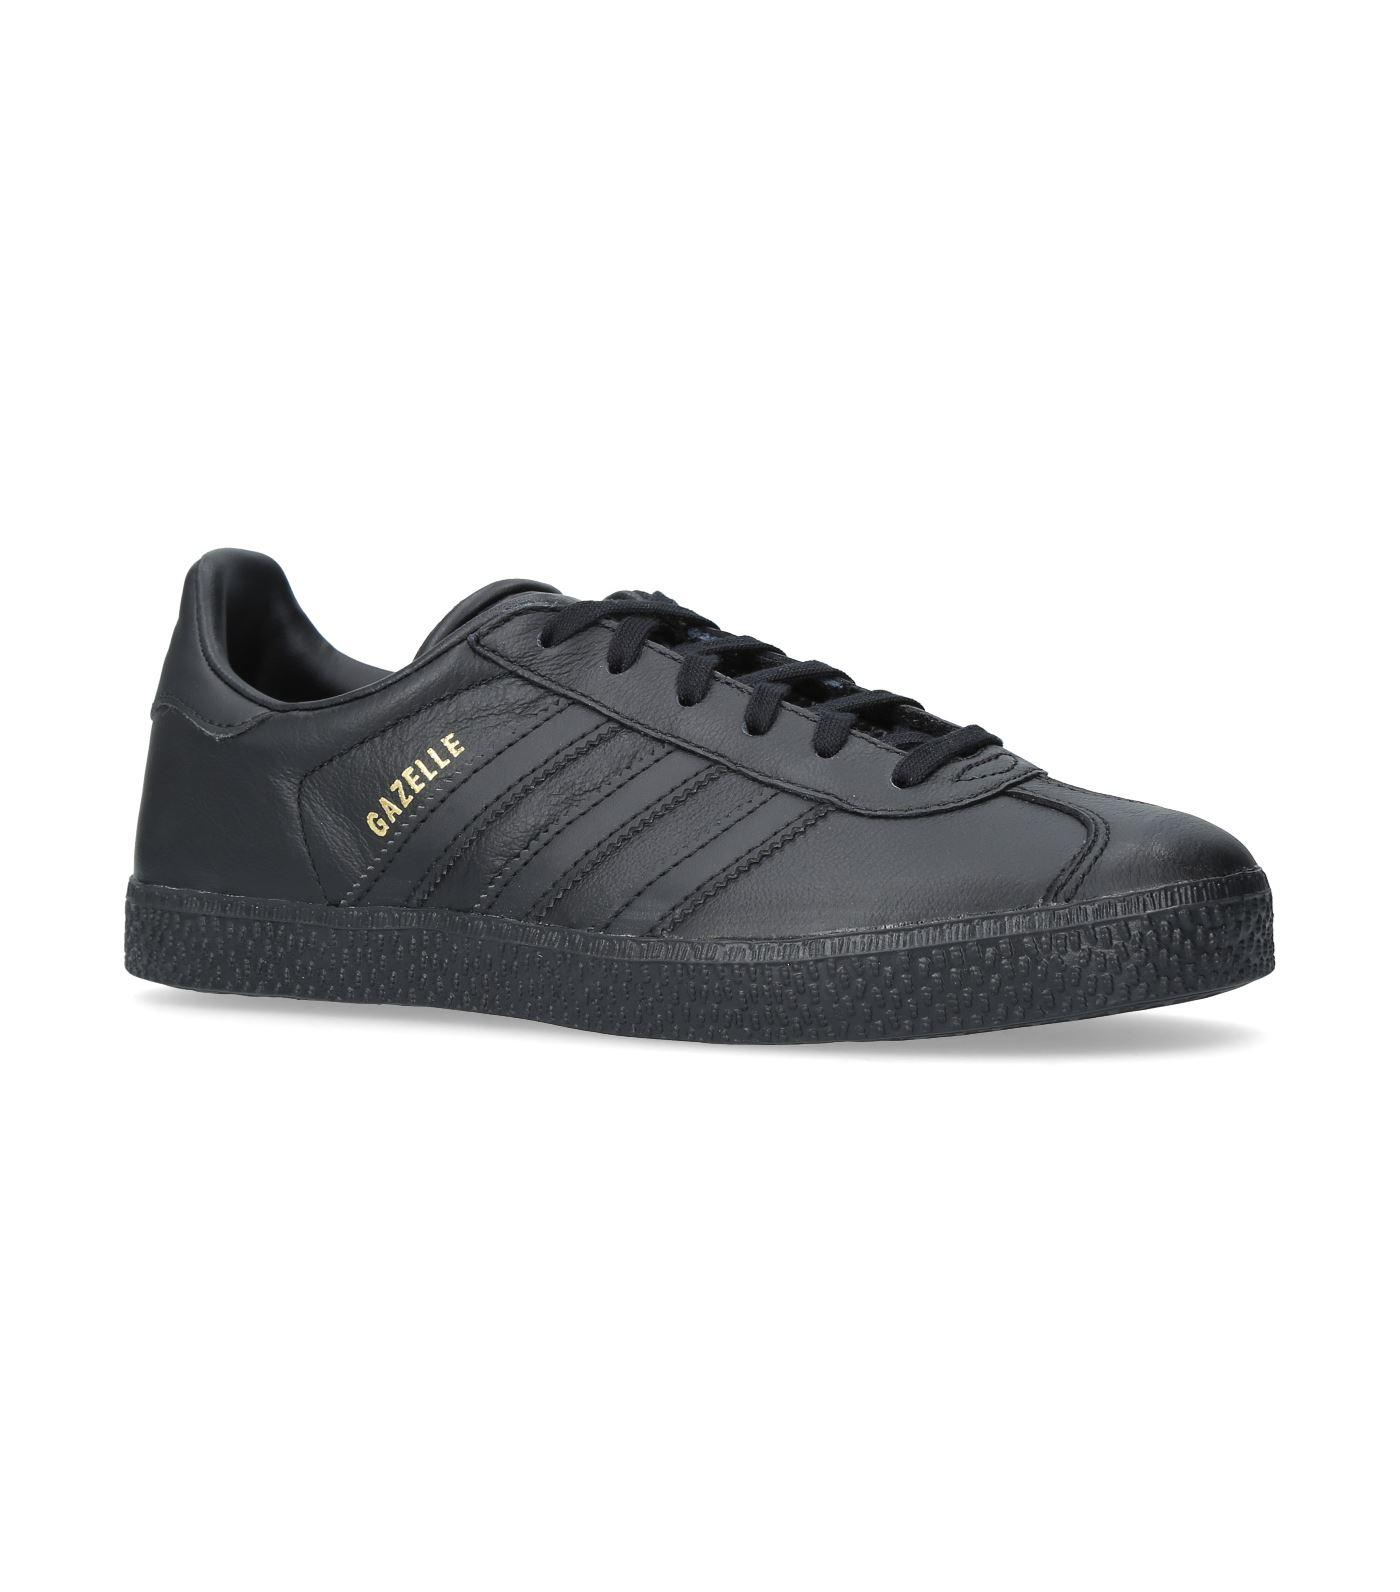 Adidas Originals Leather Gazelle Sneakers In Black